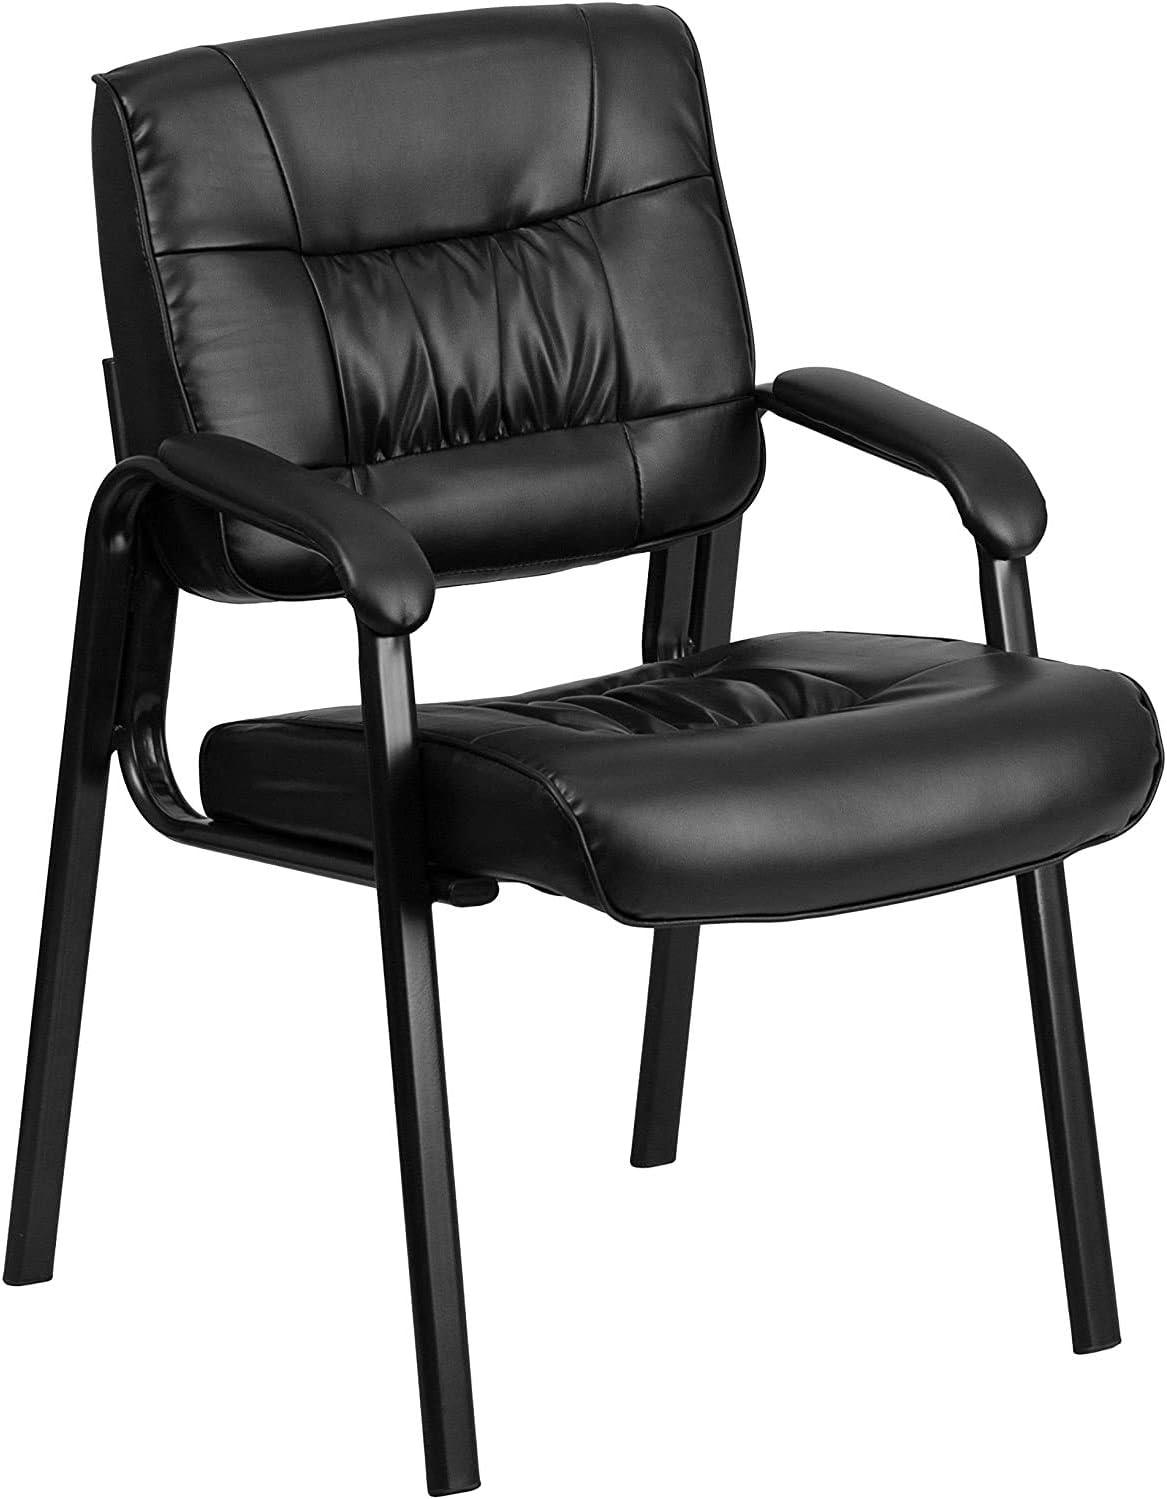 Flash Furniture Leather Side Chair, Black LeatherSoft/Black Frame